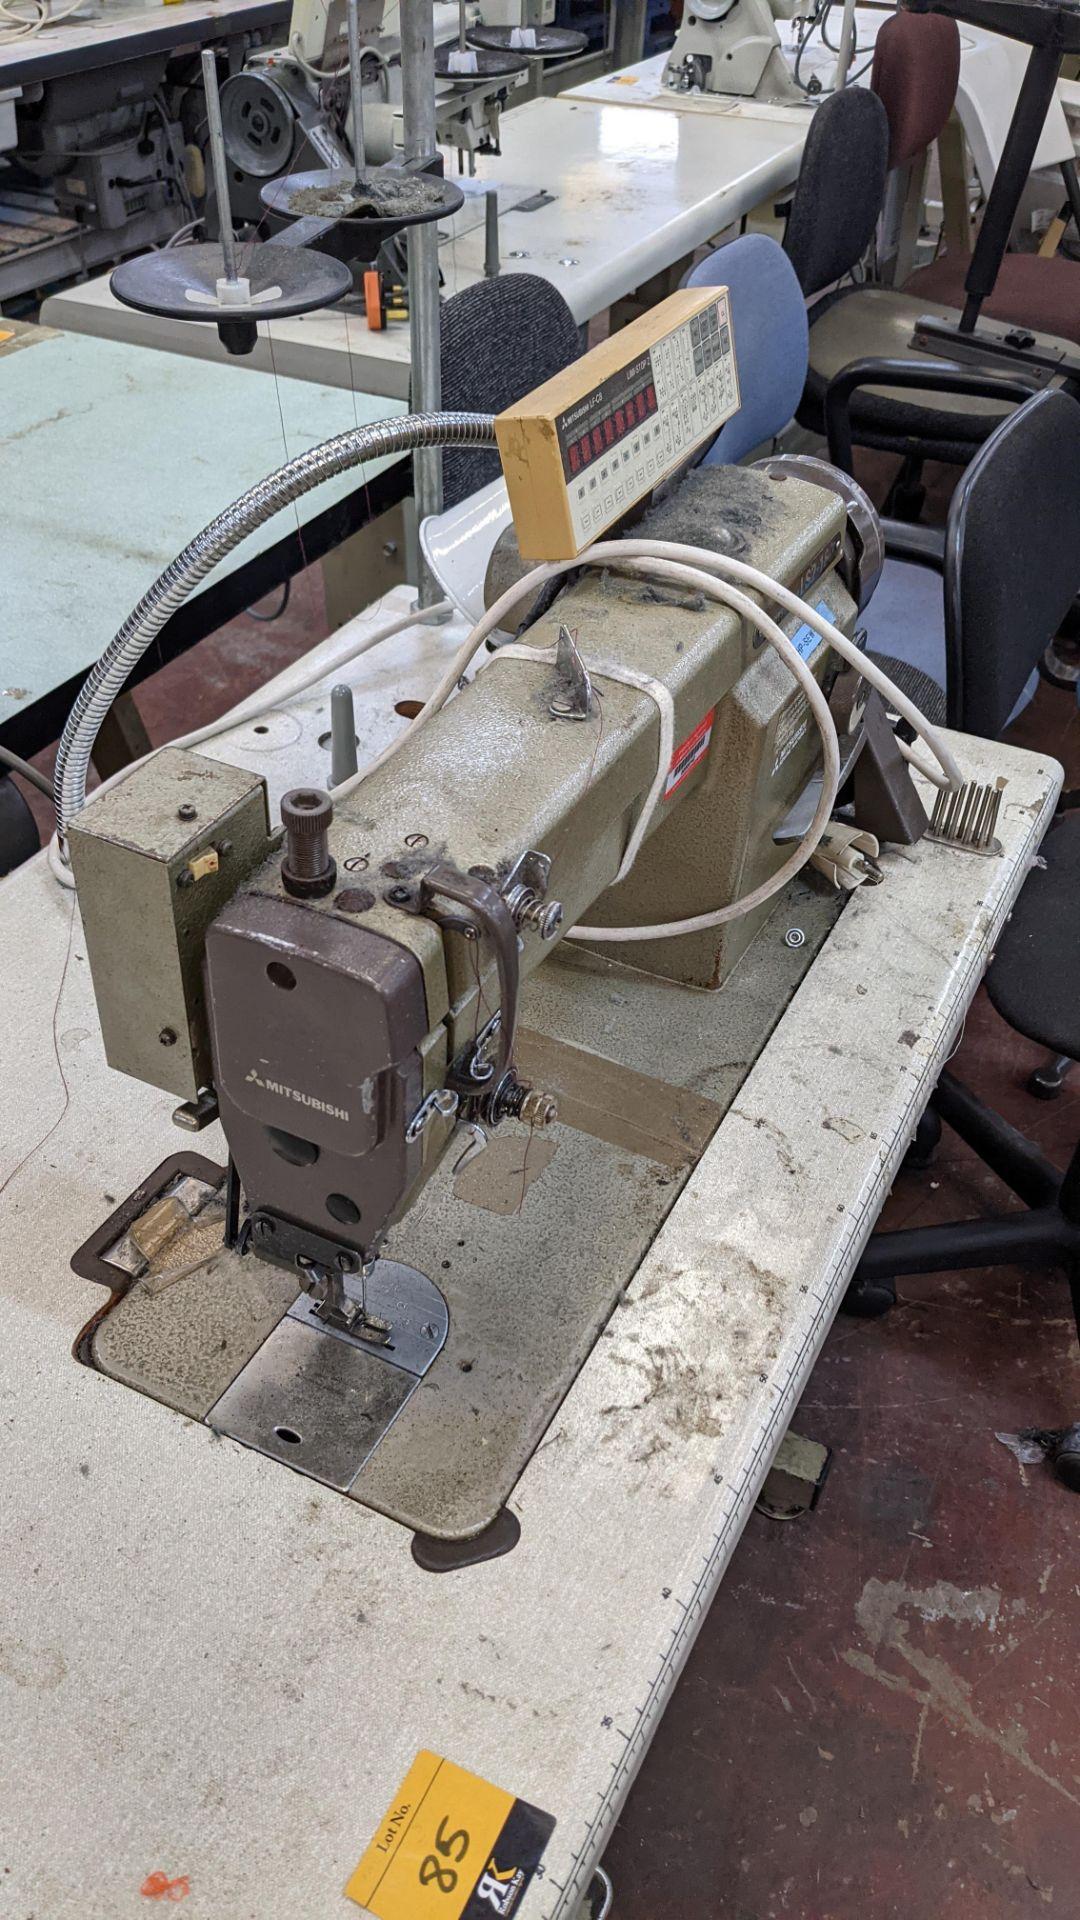 Mitsubishi LS2-180 sewing machine with Mitsubishi LF-C8 digital controller - Image 7 of 12